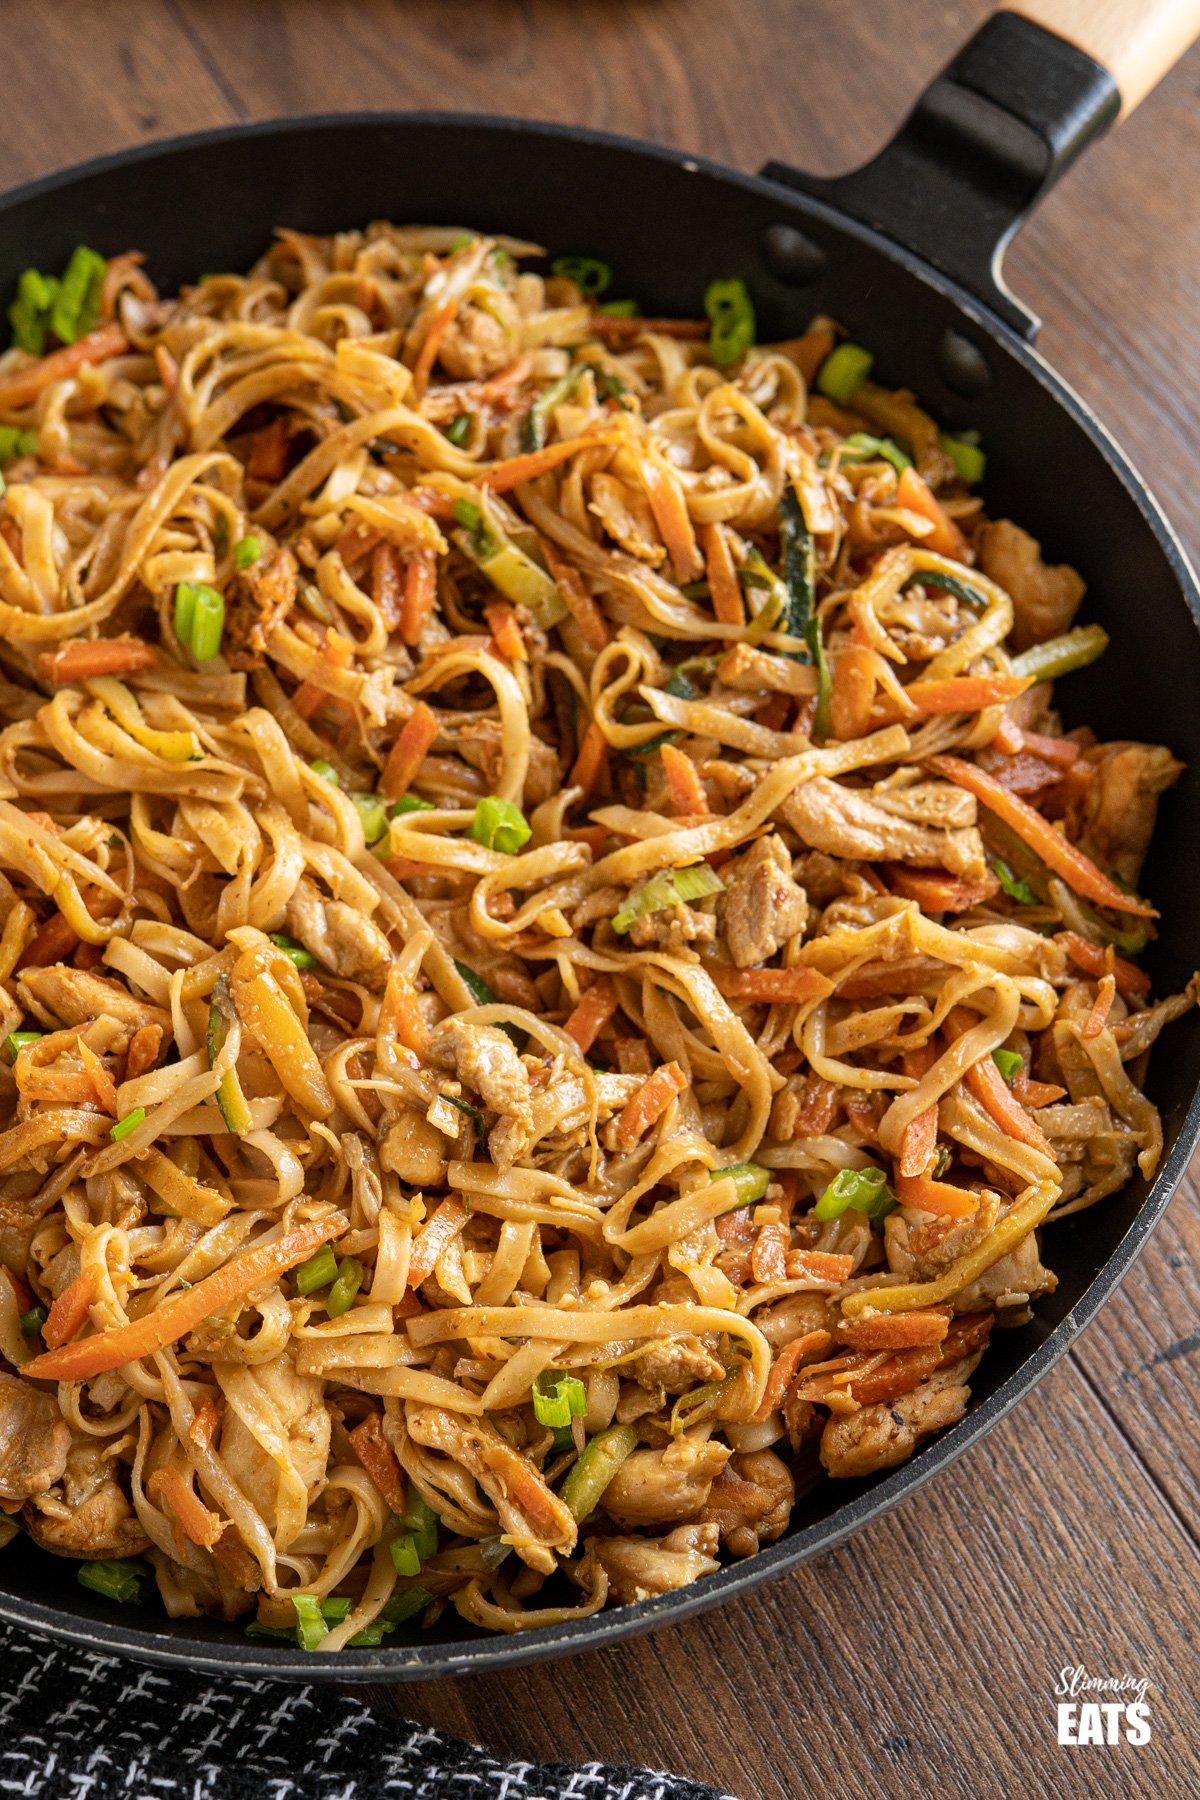 Easy Peanut Chicken Noodles in frying pan